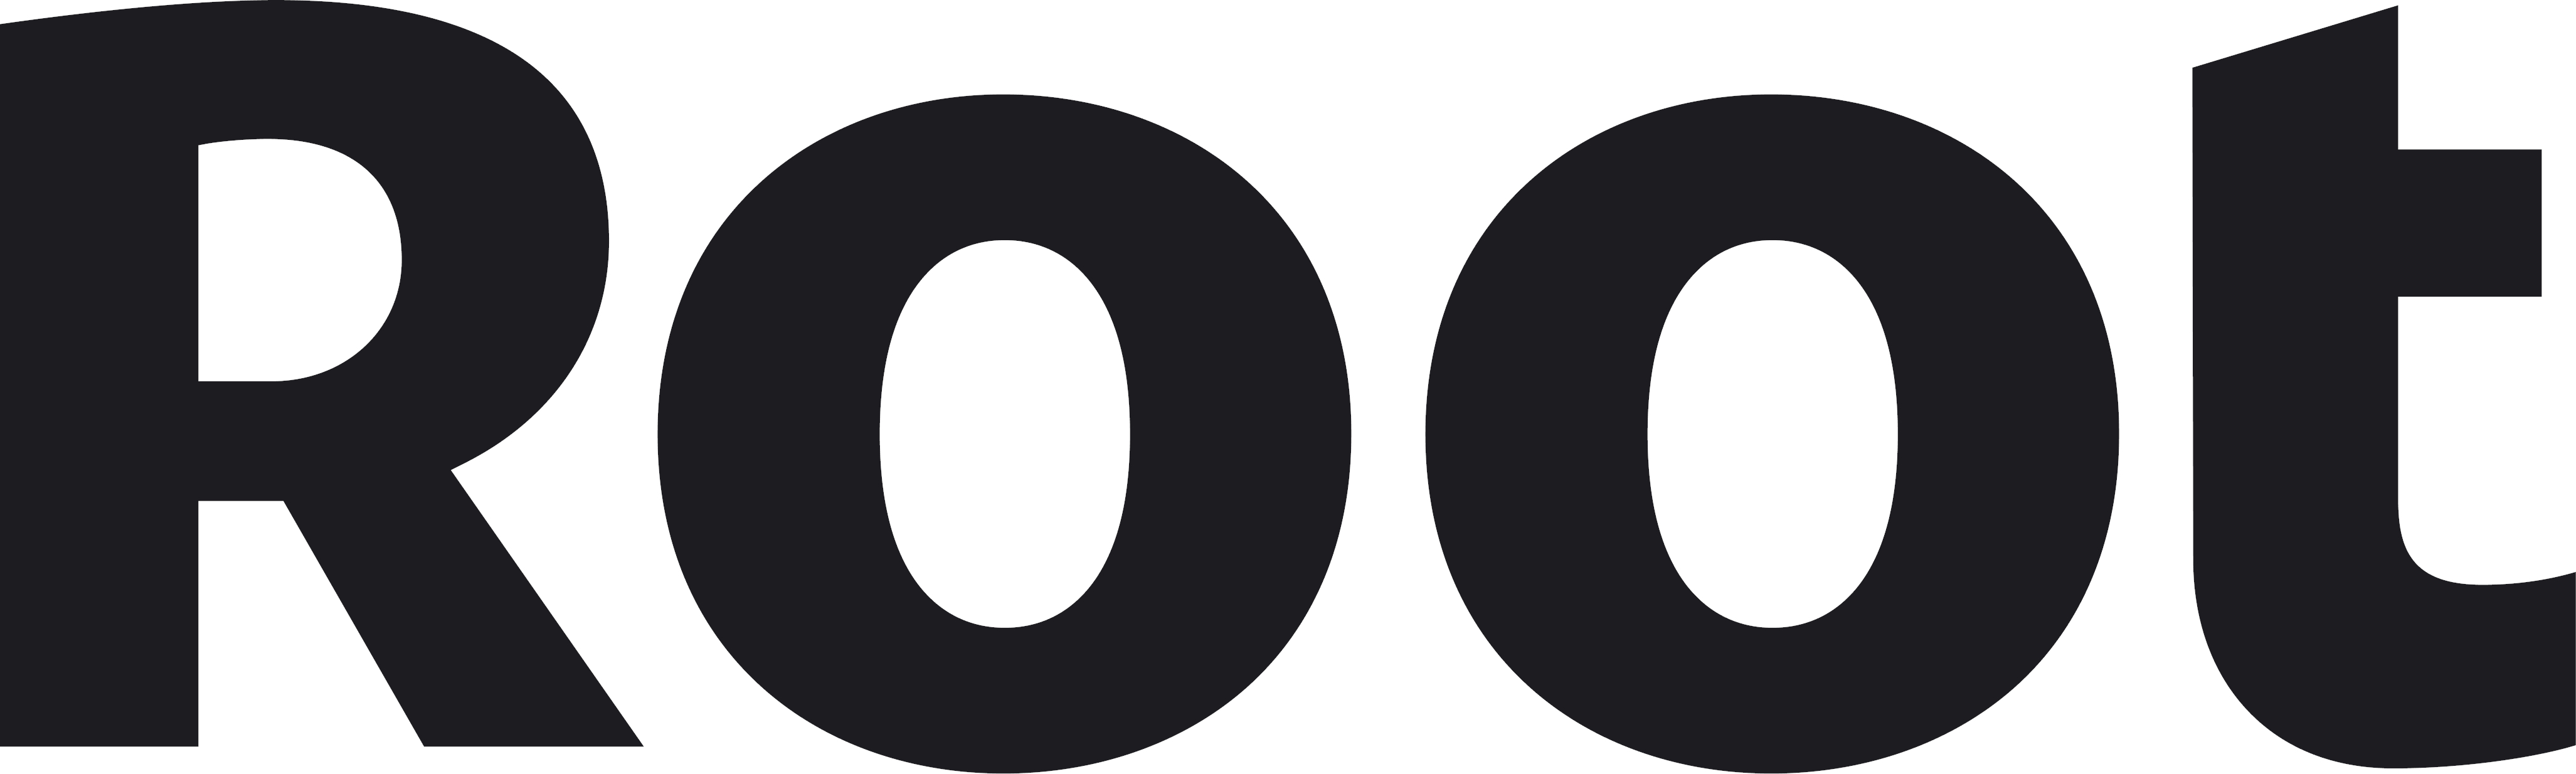 https://cdn.kscope.io/4784f9817197e5e538fb92893bd2bc63-root-logo2.jpg